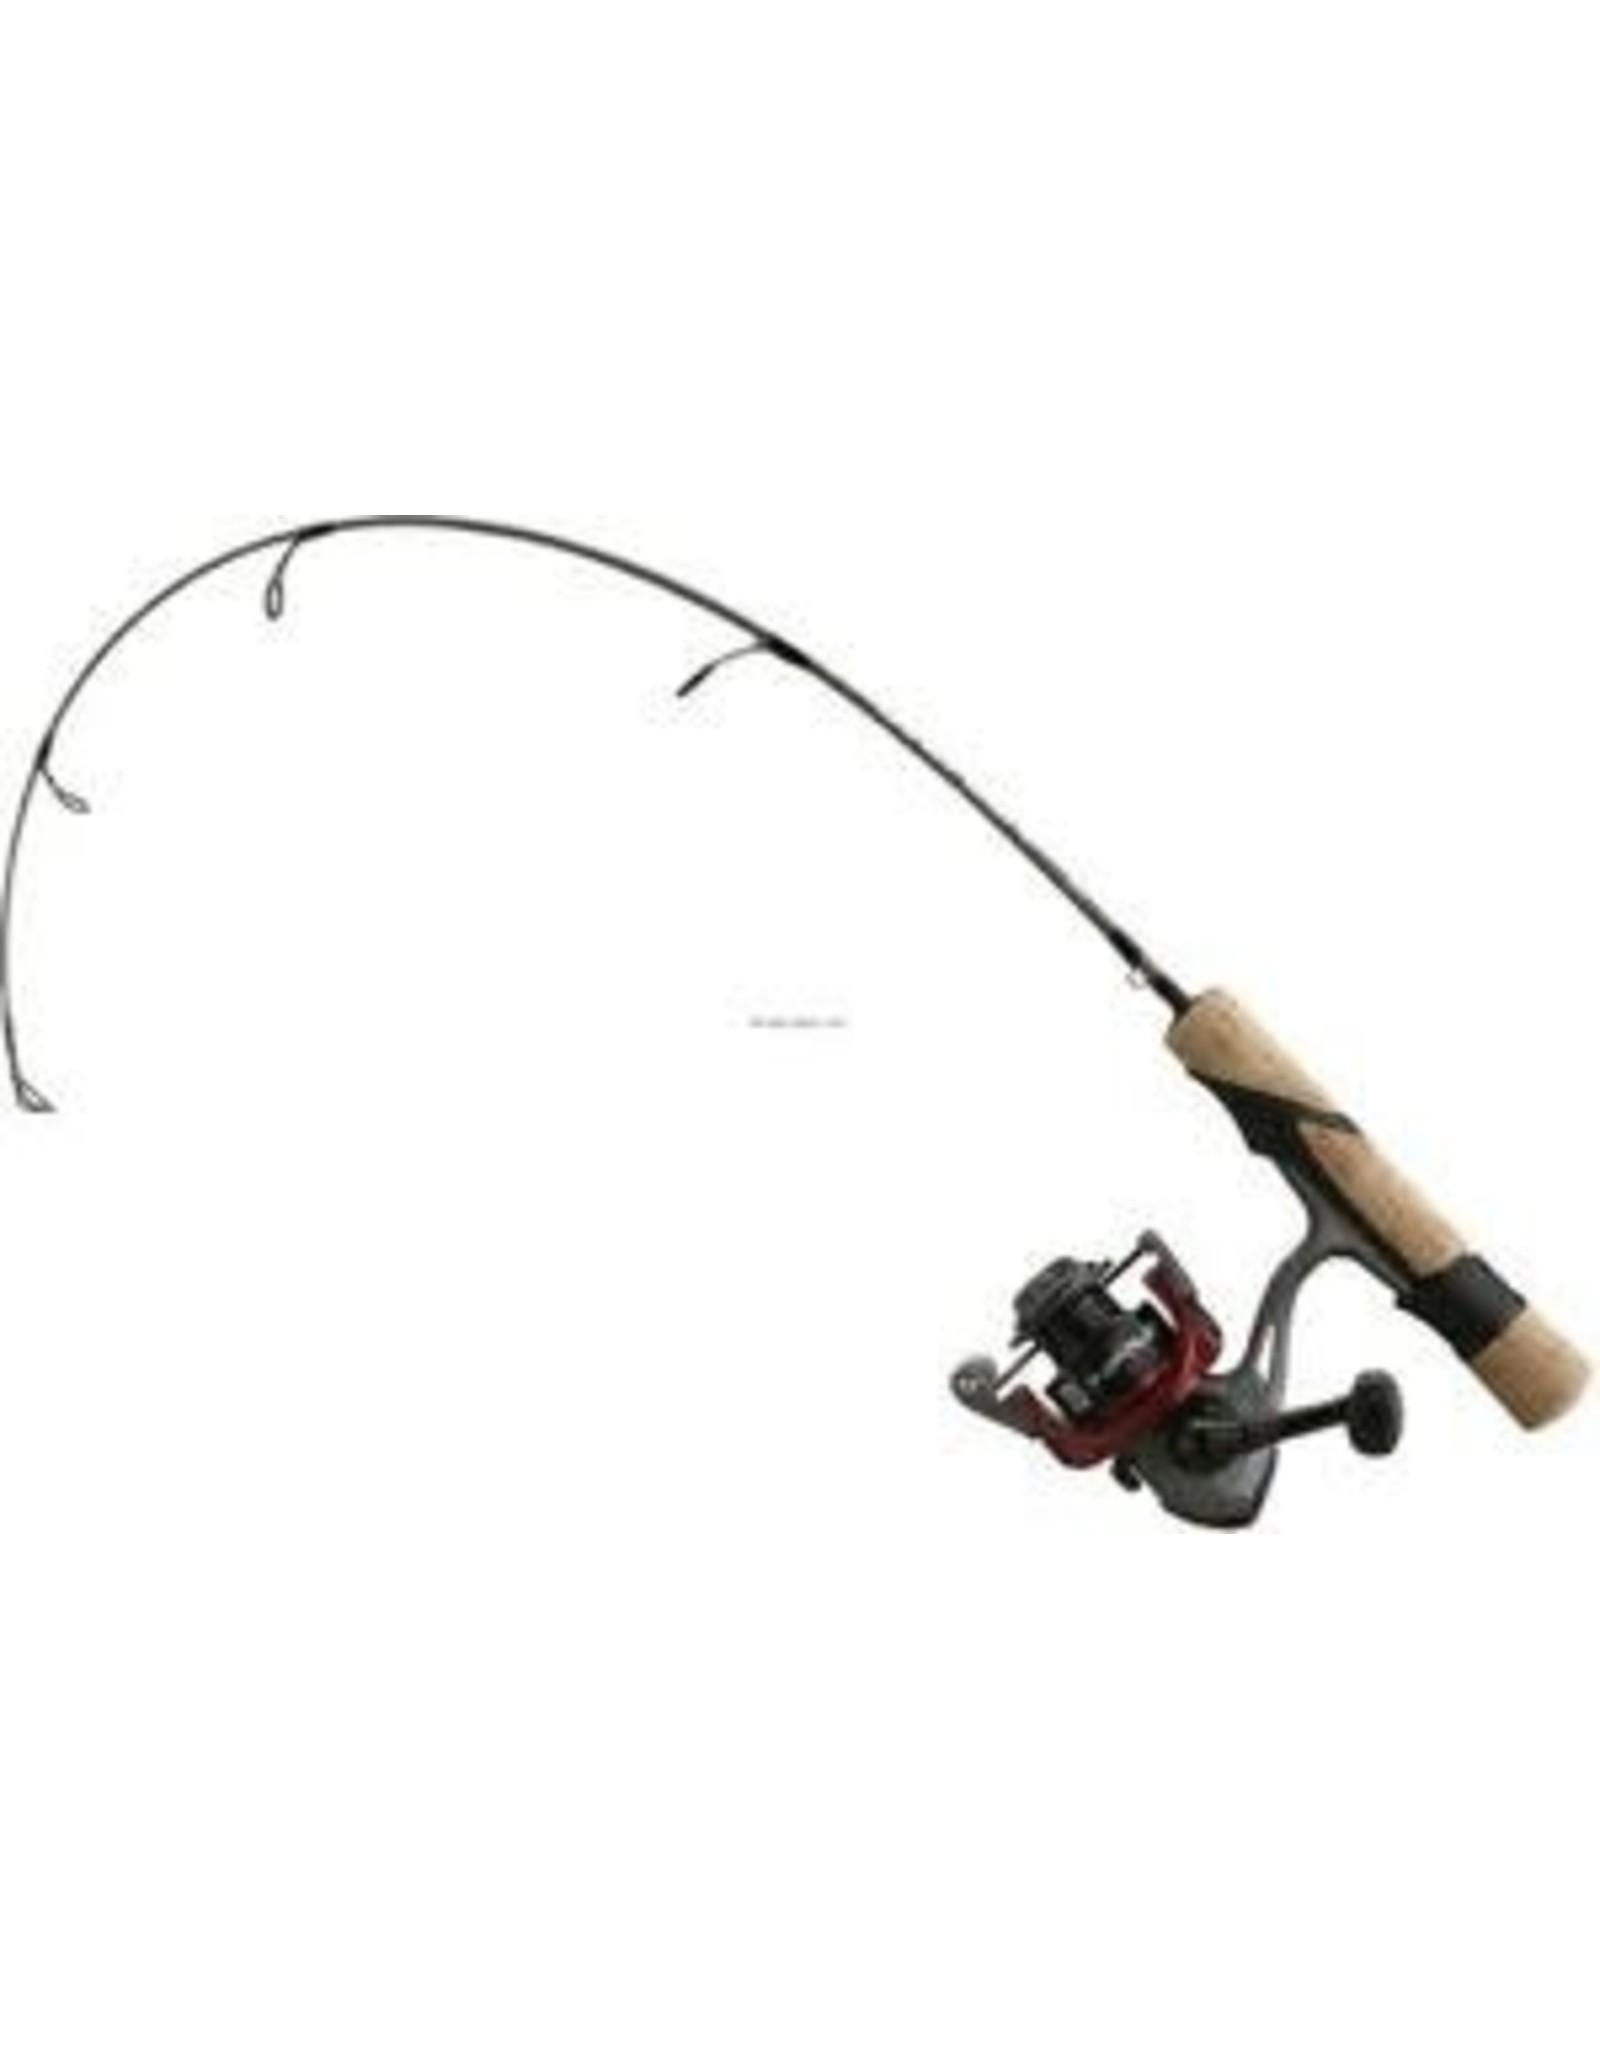 "13 Fishing 13 Fishing - Microtec Walleye Ice Combo 36"" Medium"